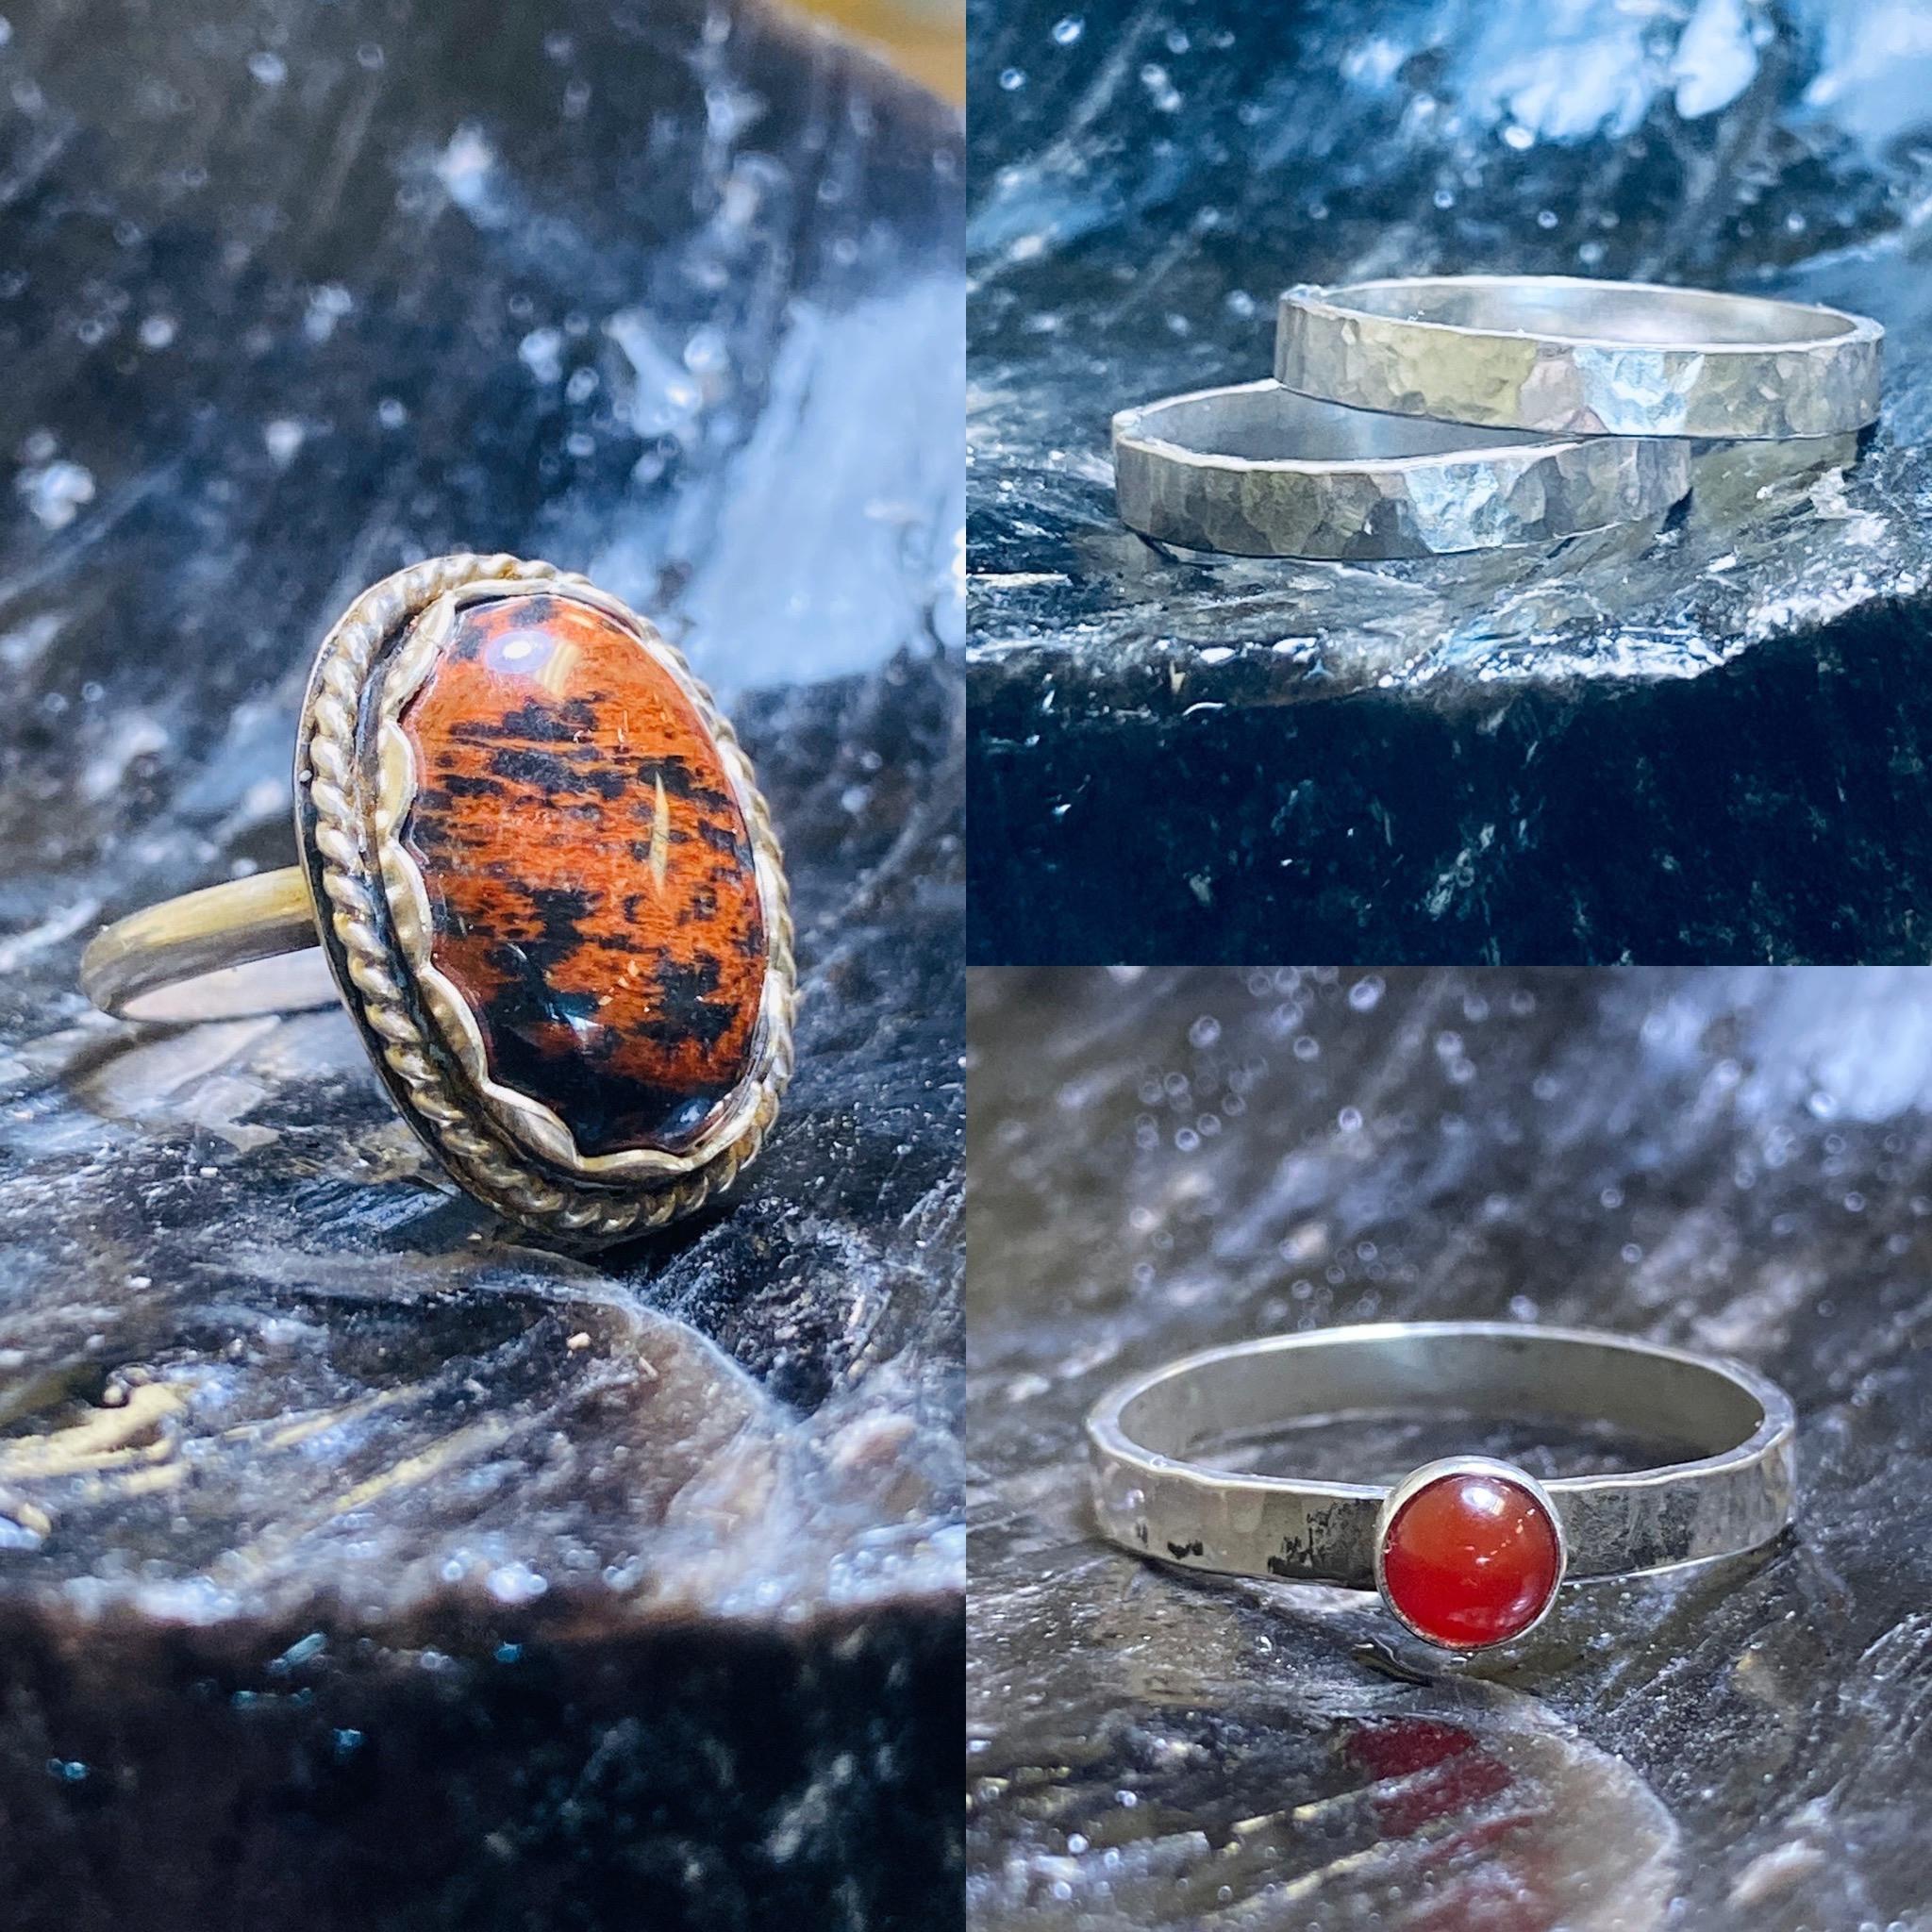 3 in 1 Jewelry Making-7/25/21 @9:30